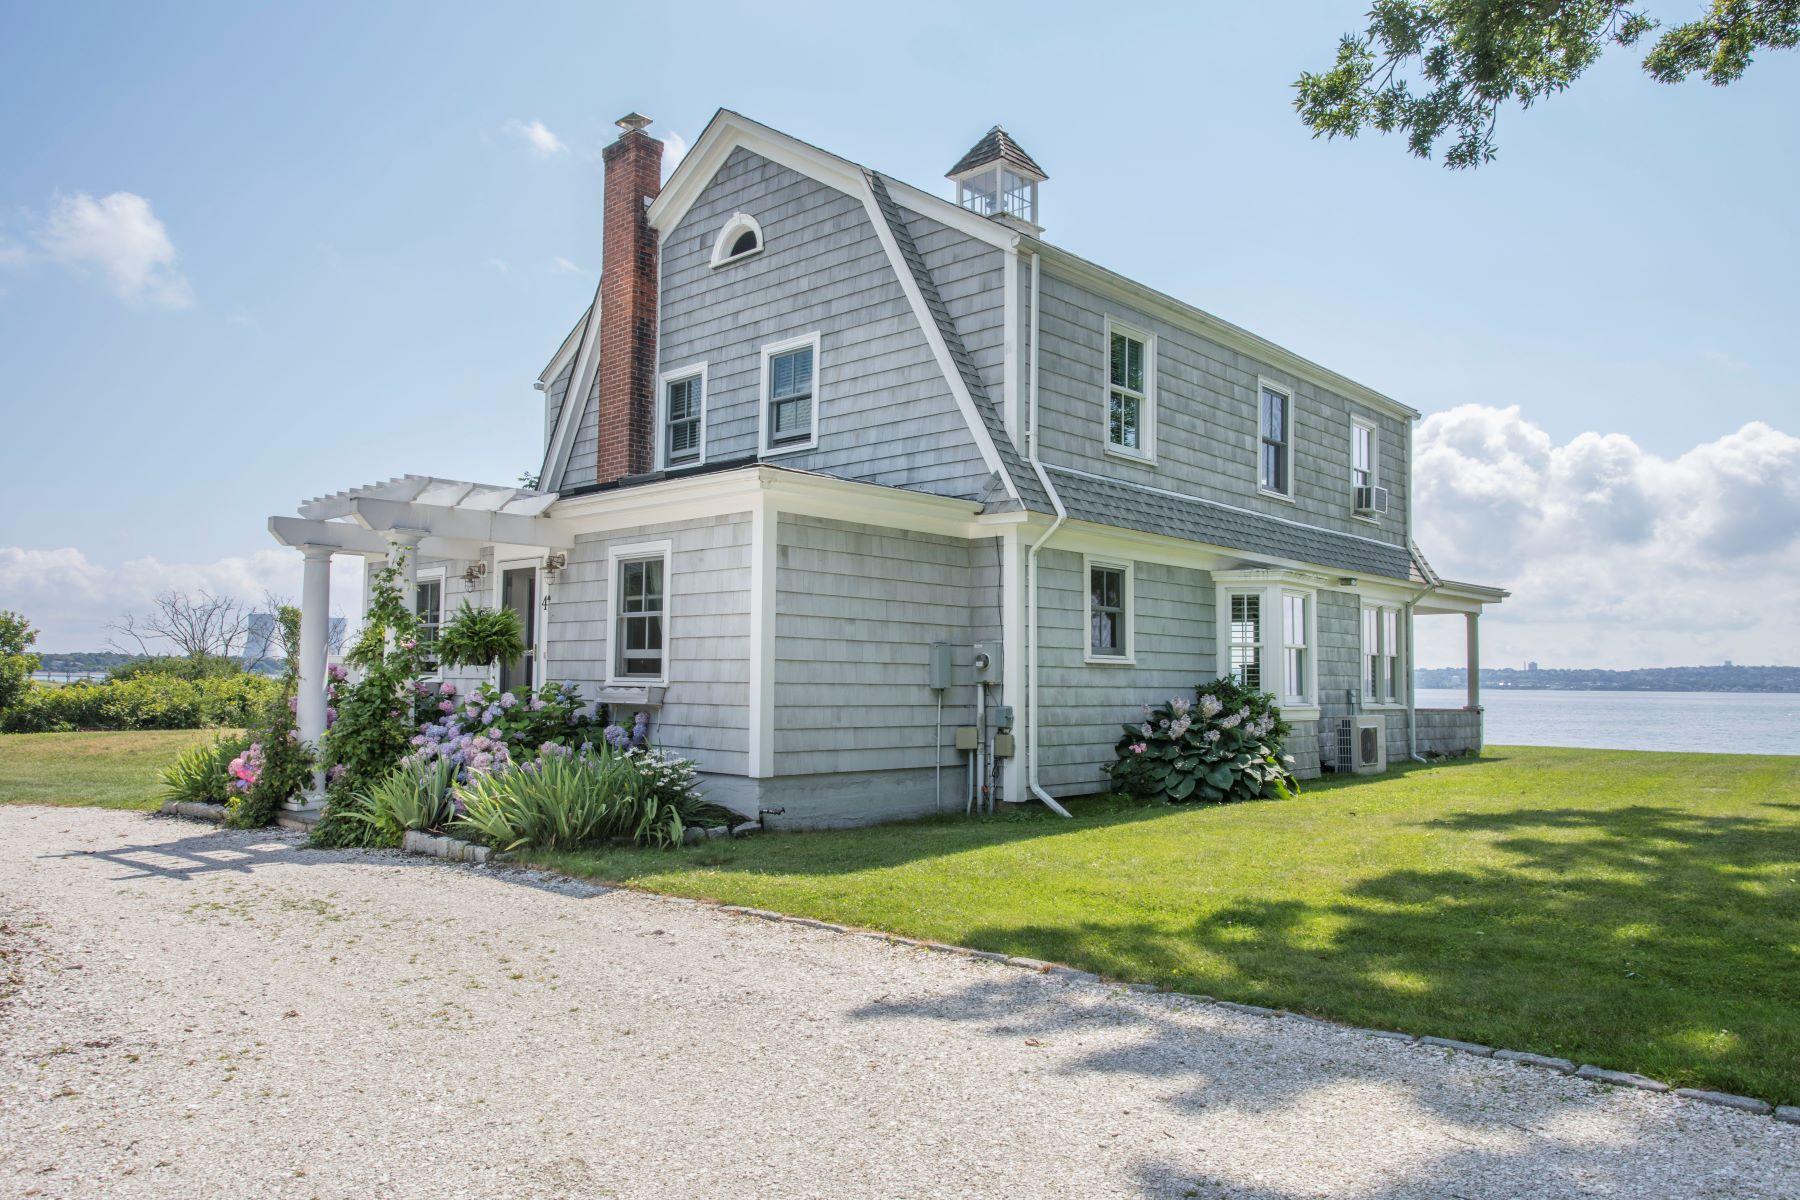 Single Family Home for Sale at Touisset Seaside Cottage 4 Calder Drive Warren, Rhode Island 02885 United States